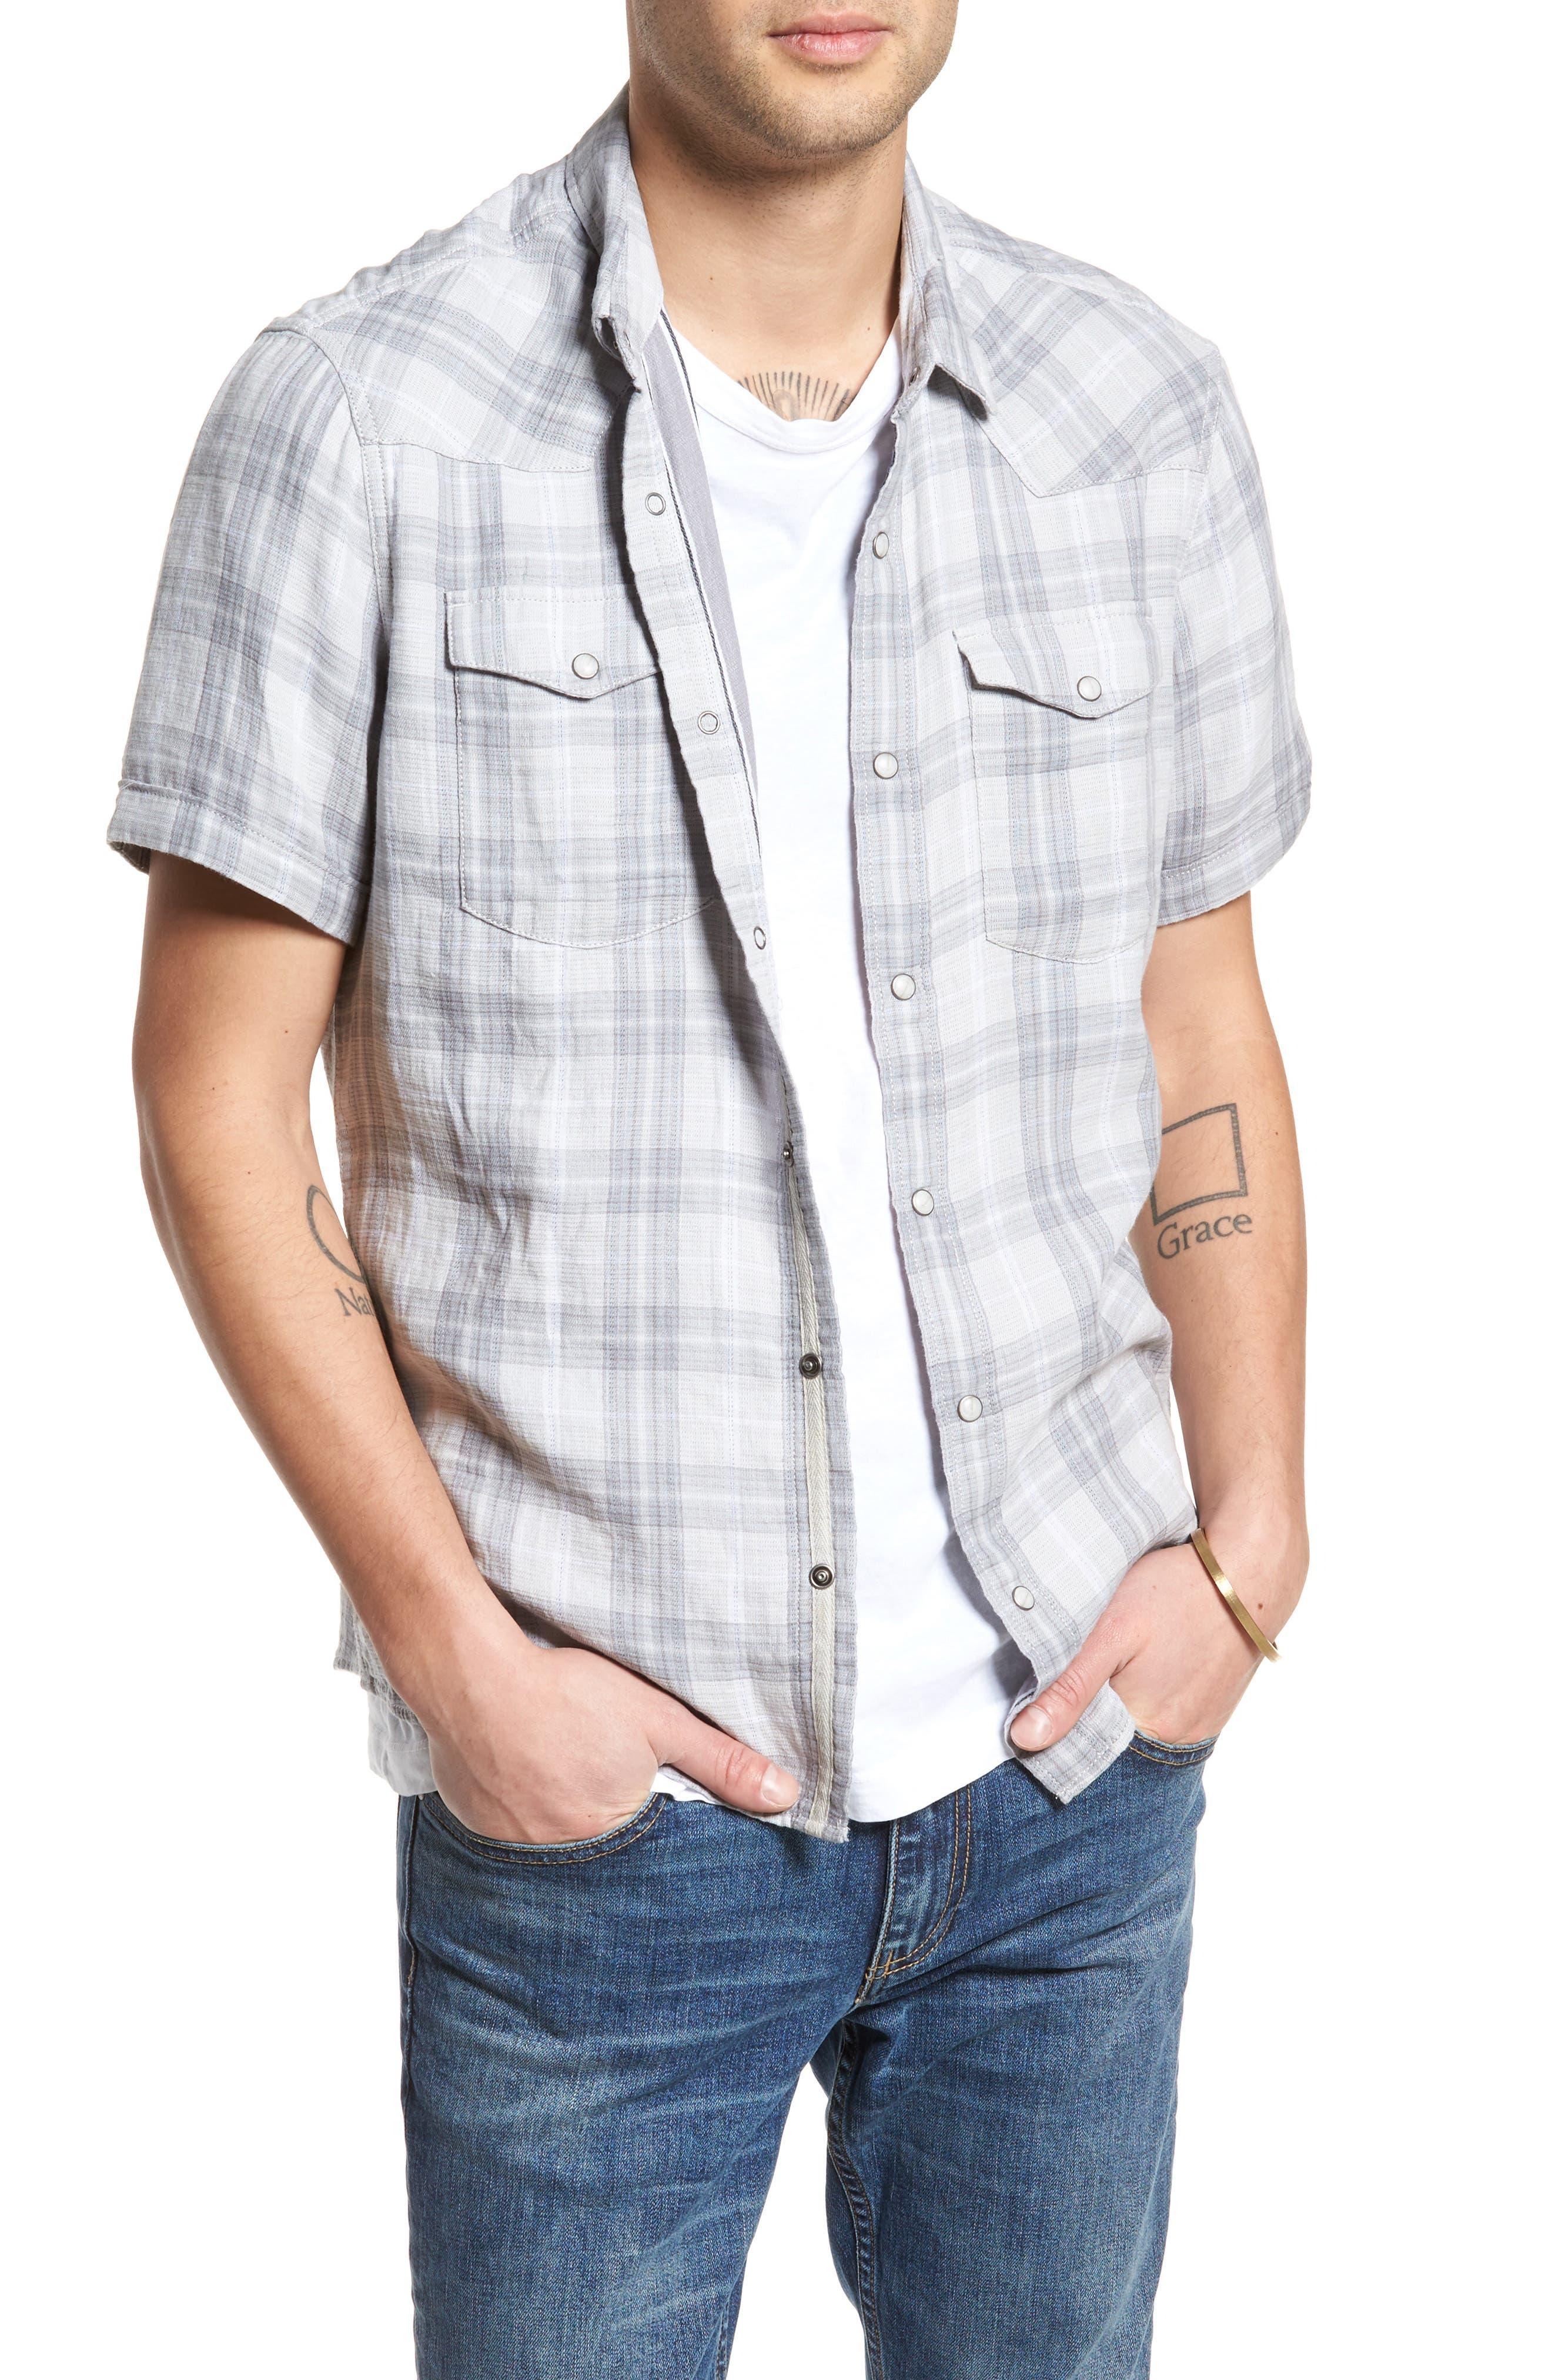 Plaid Short Sleeve Sport Shirt,                             Main thumbnail 1, color,                             Grey Sleet Plaid Duofold